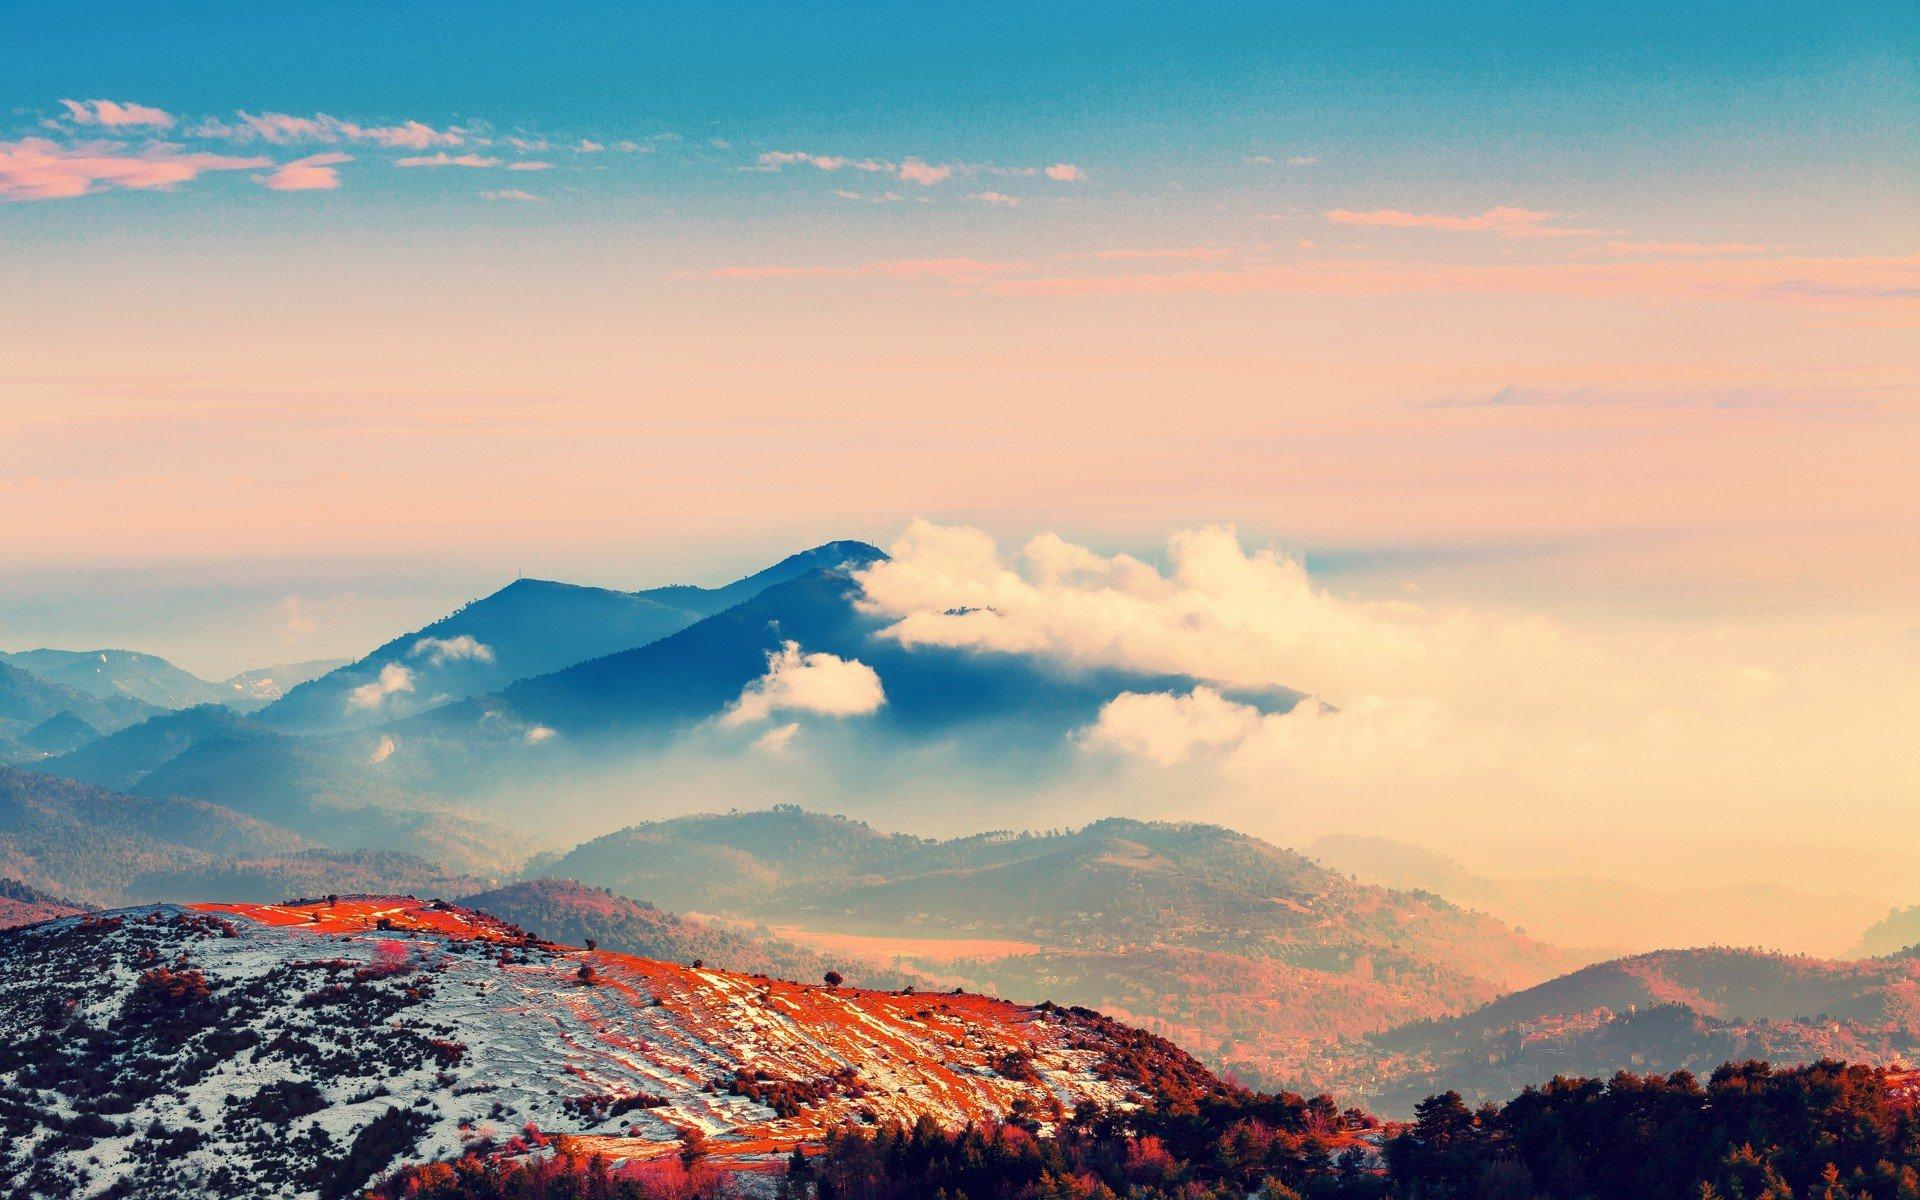 4k wallpaper mountains wallpapersafari - Wallpaper hd 4k ...